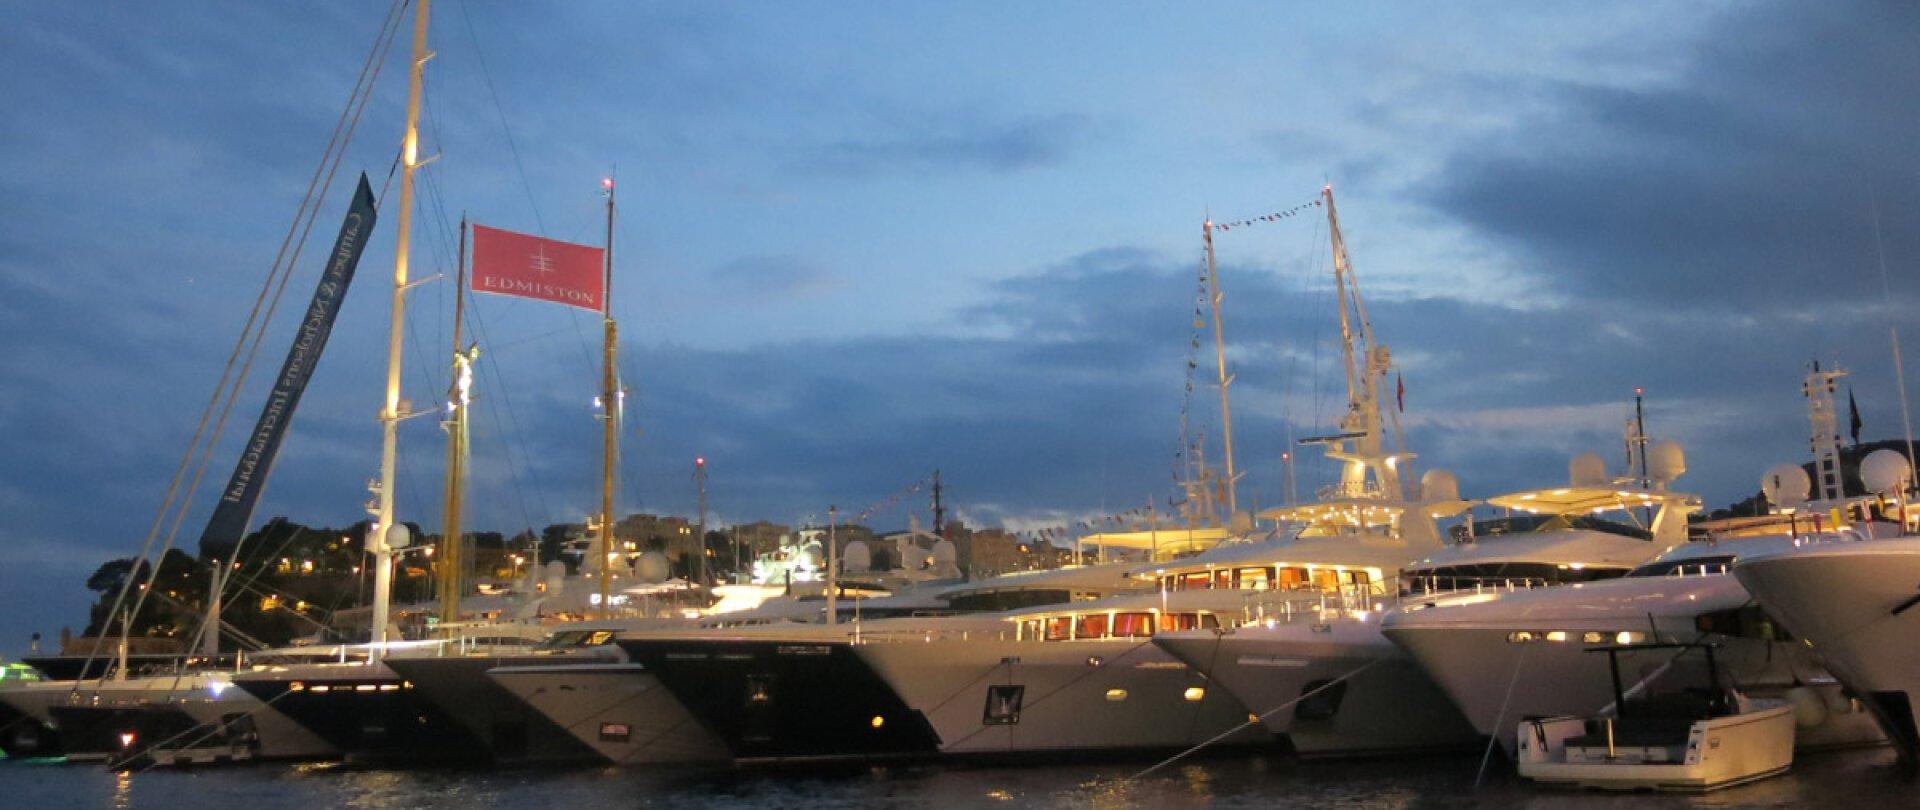 Monaco Yacht Show 2015 photo 12